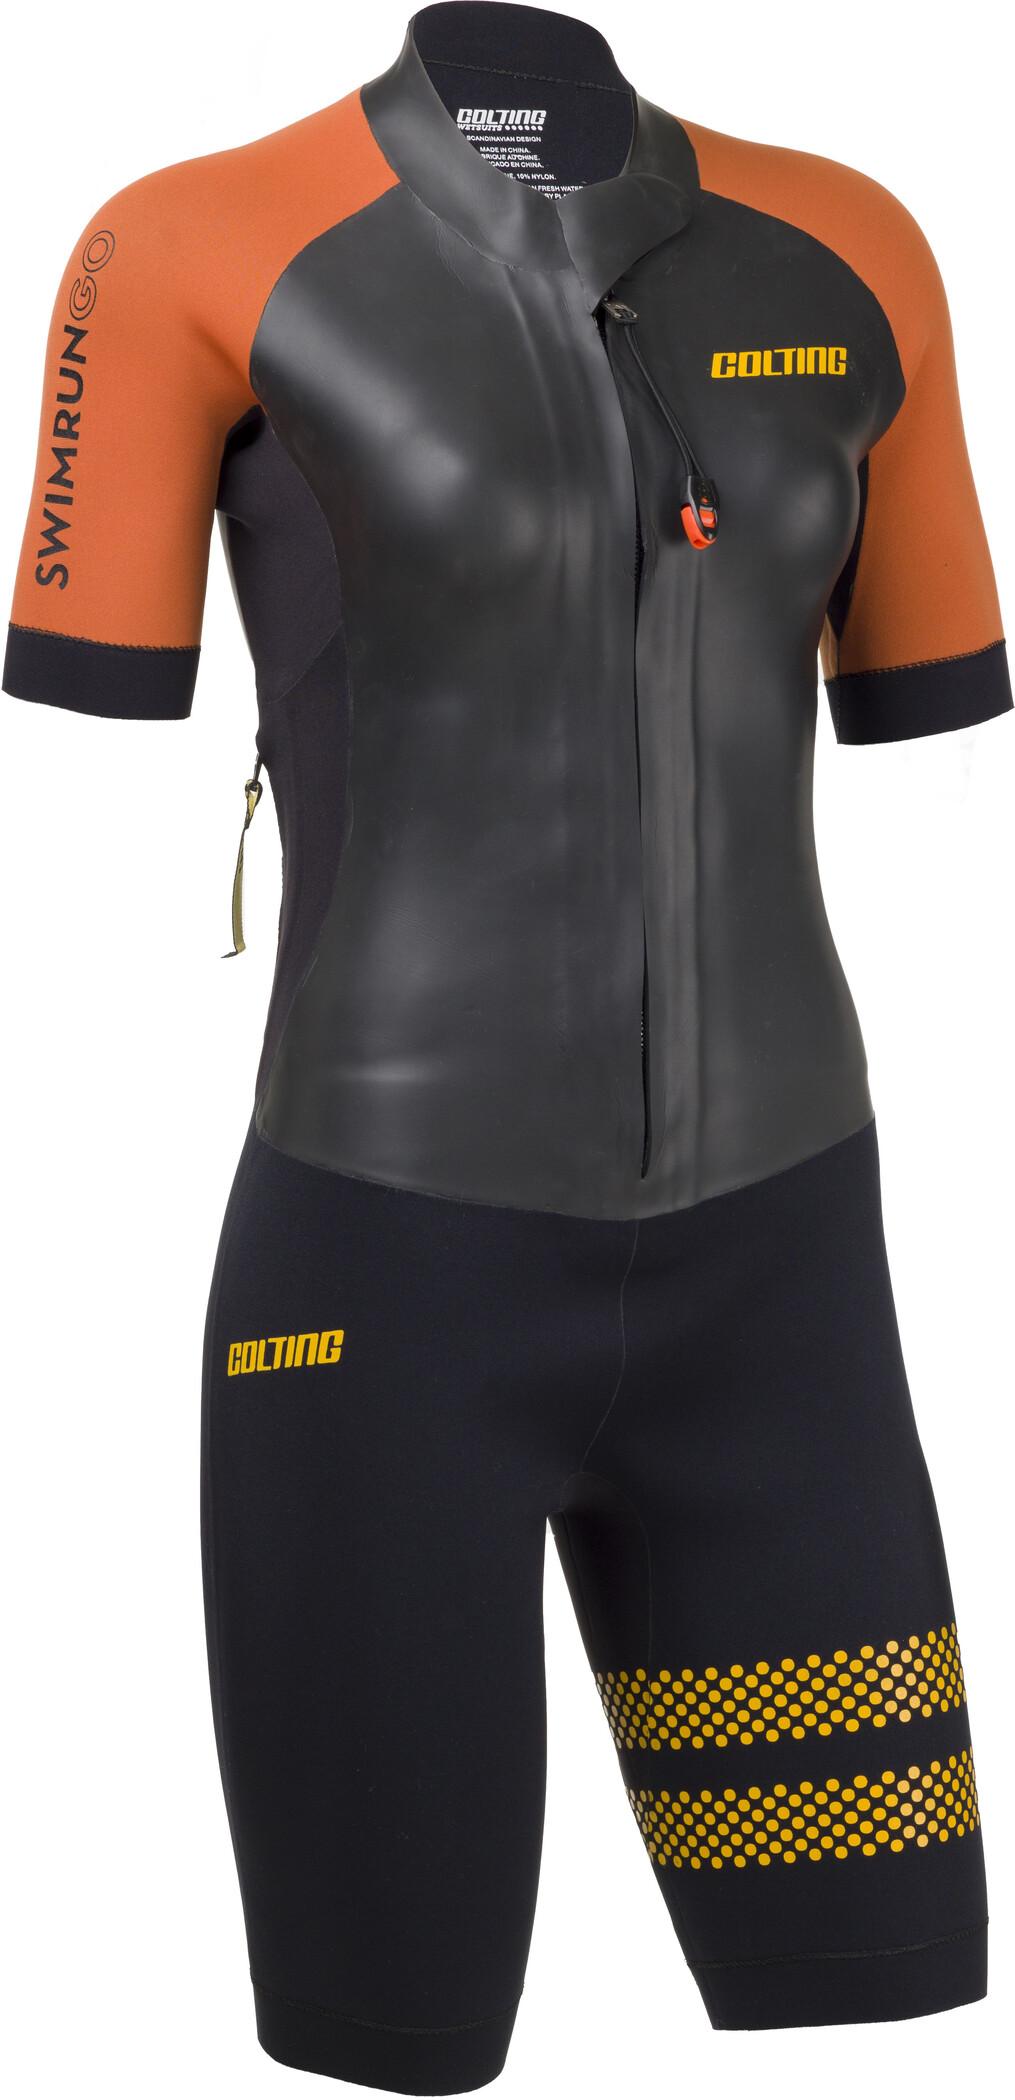 Colting Wetsuits Swimrun Go Våddragt Damer, black/orange (2019) | swim_clothes